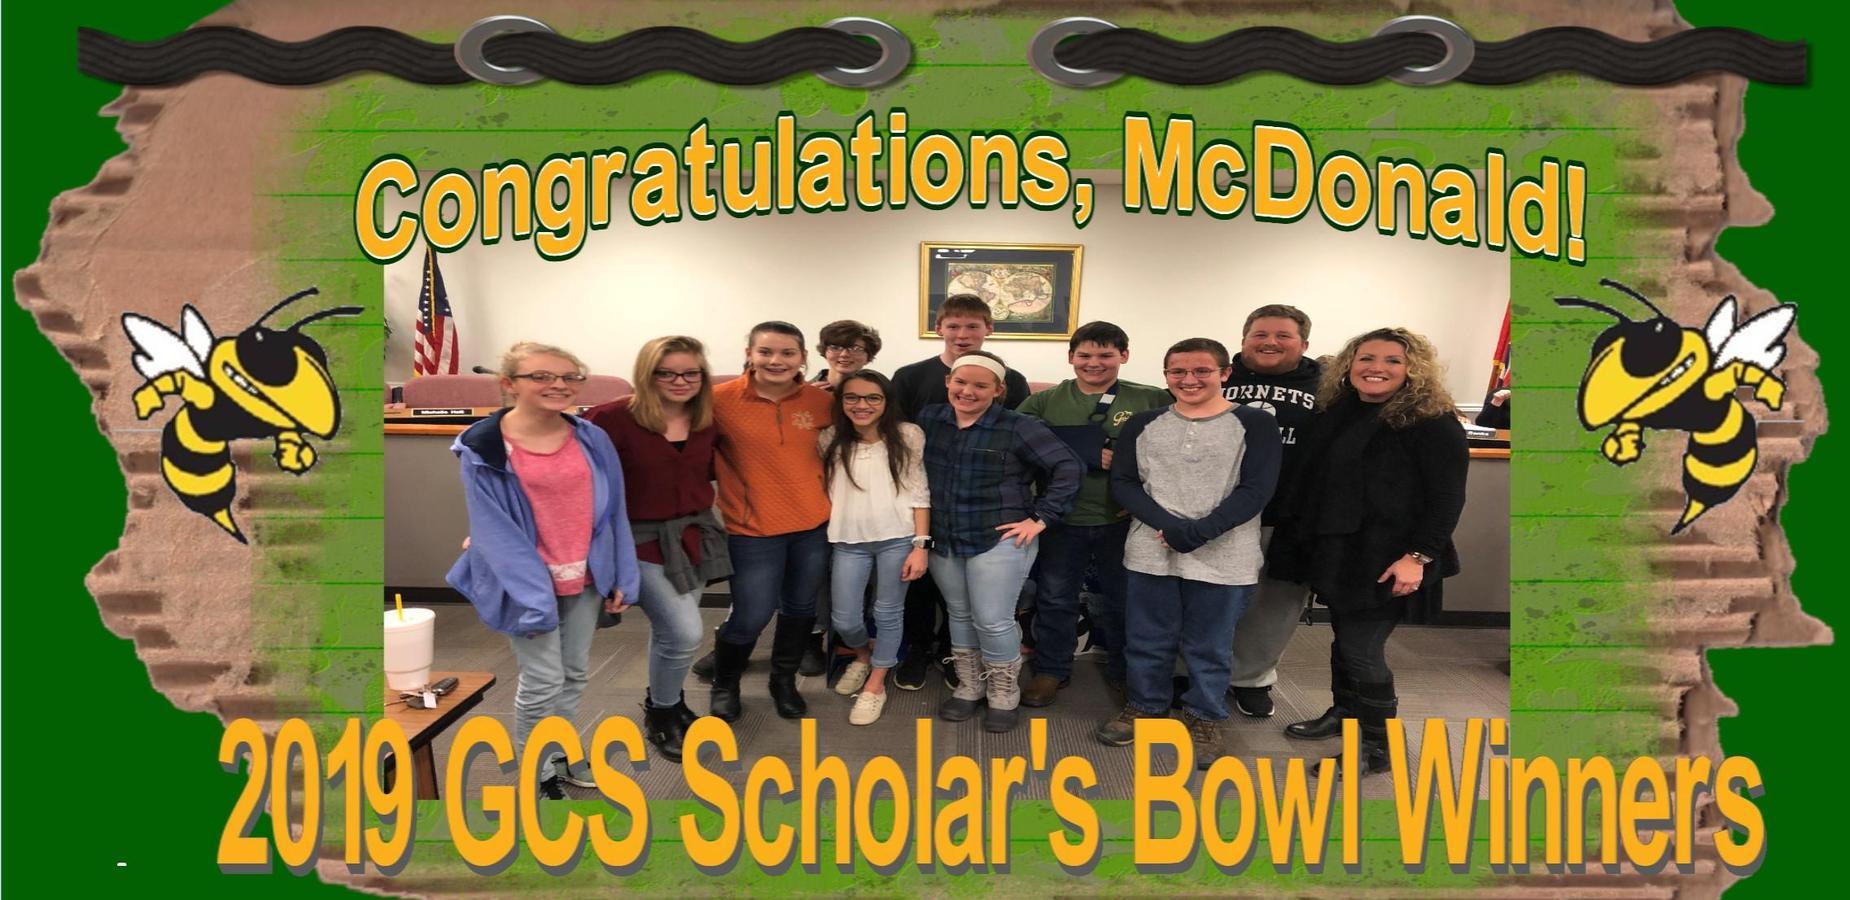 McDonald Hornets:  2019 GCS Scholar's Bowl Winners!